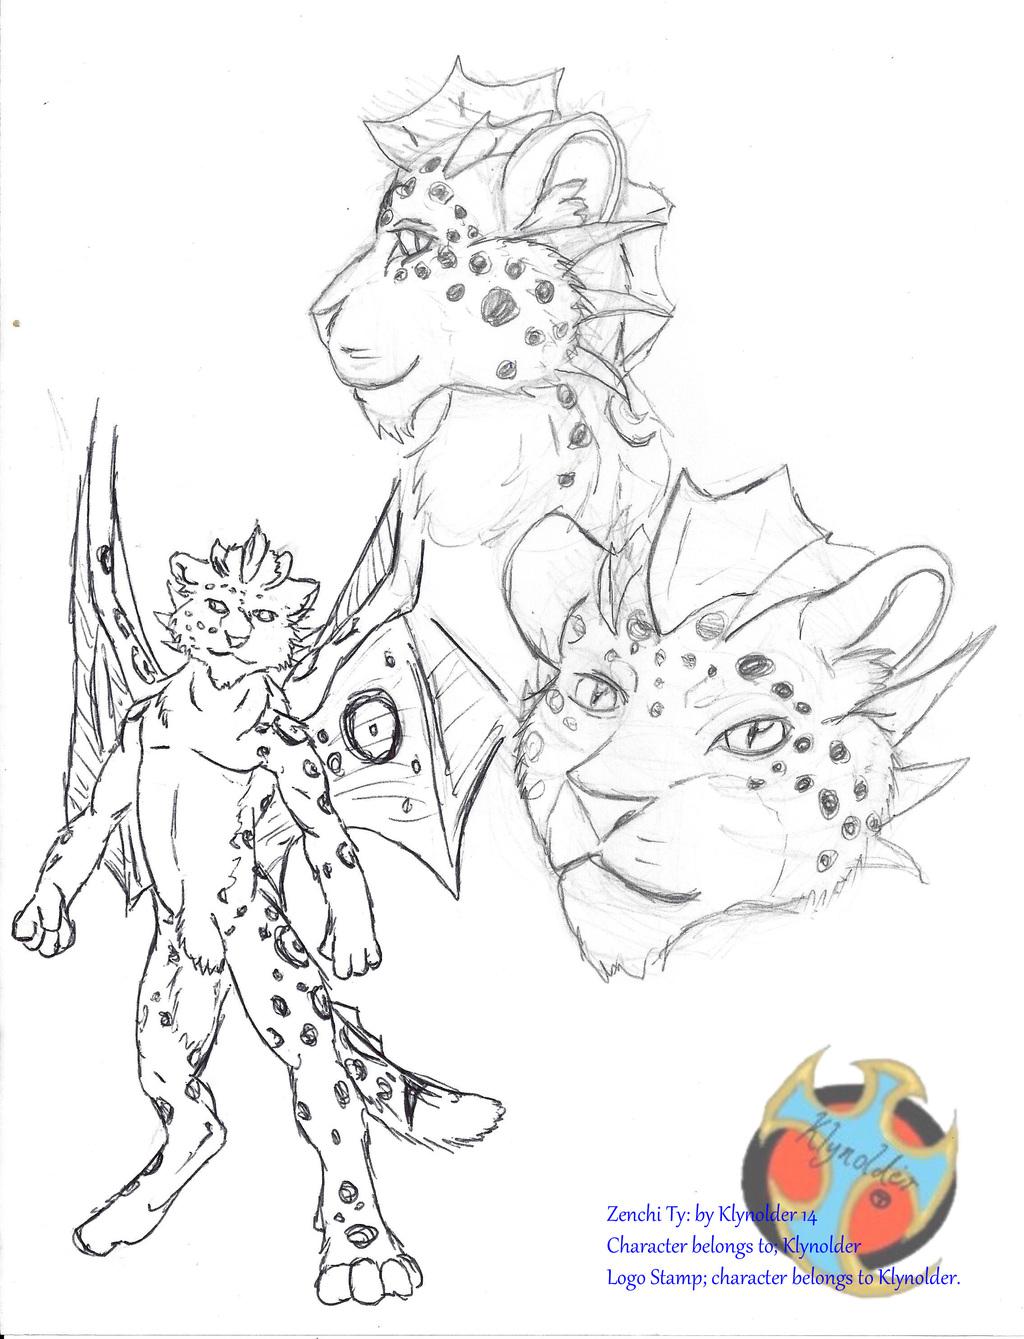 Zenchi (Character)